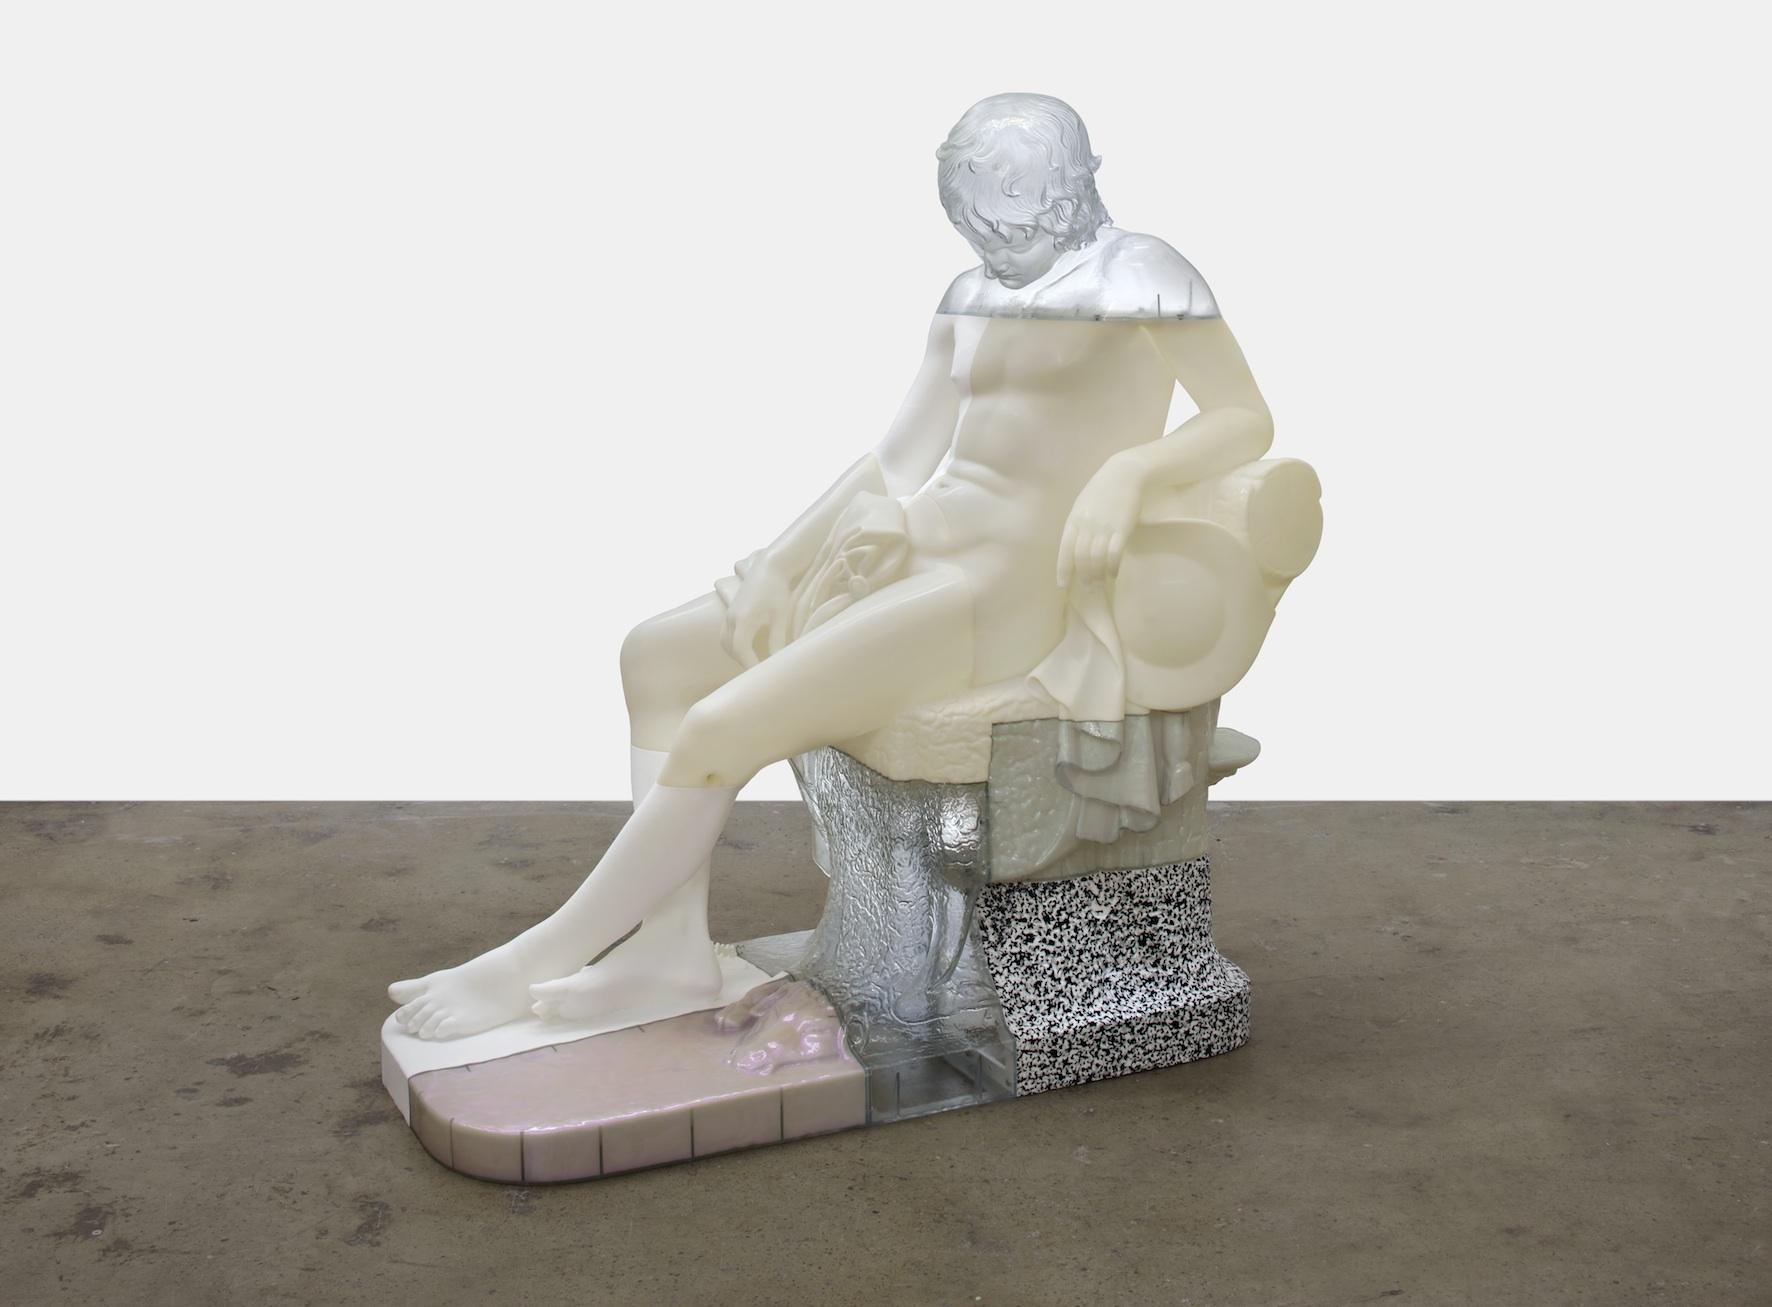 Oliver Laric, Sleeping Boy, 2016